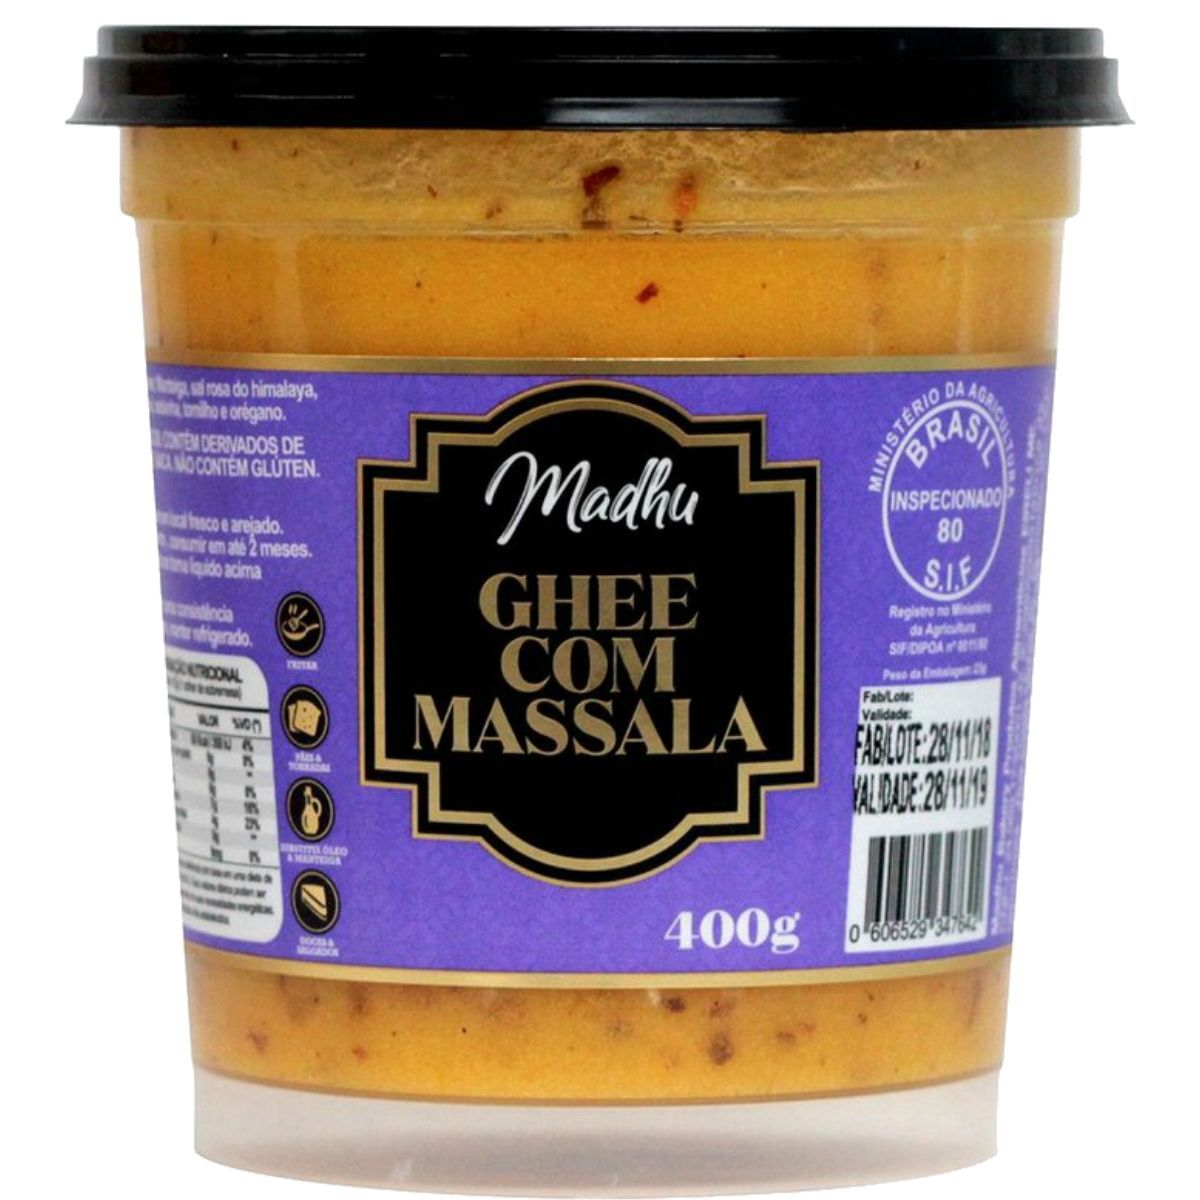 Manteiga Ghee C/ Massala Clarificada 400g - Madhu Bakery